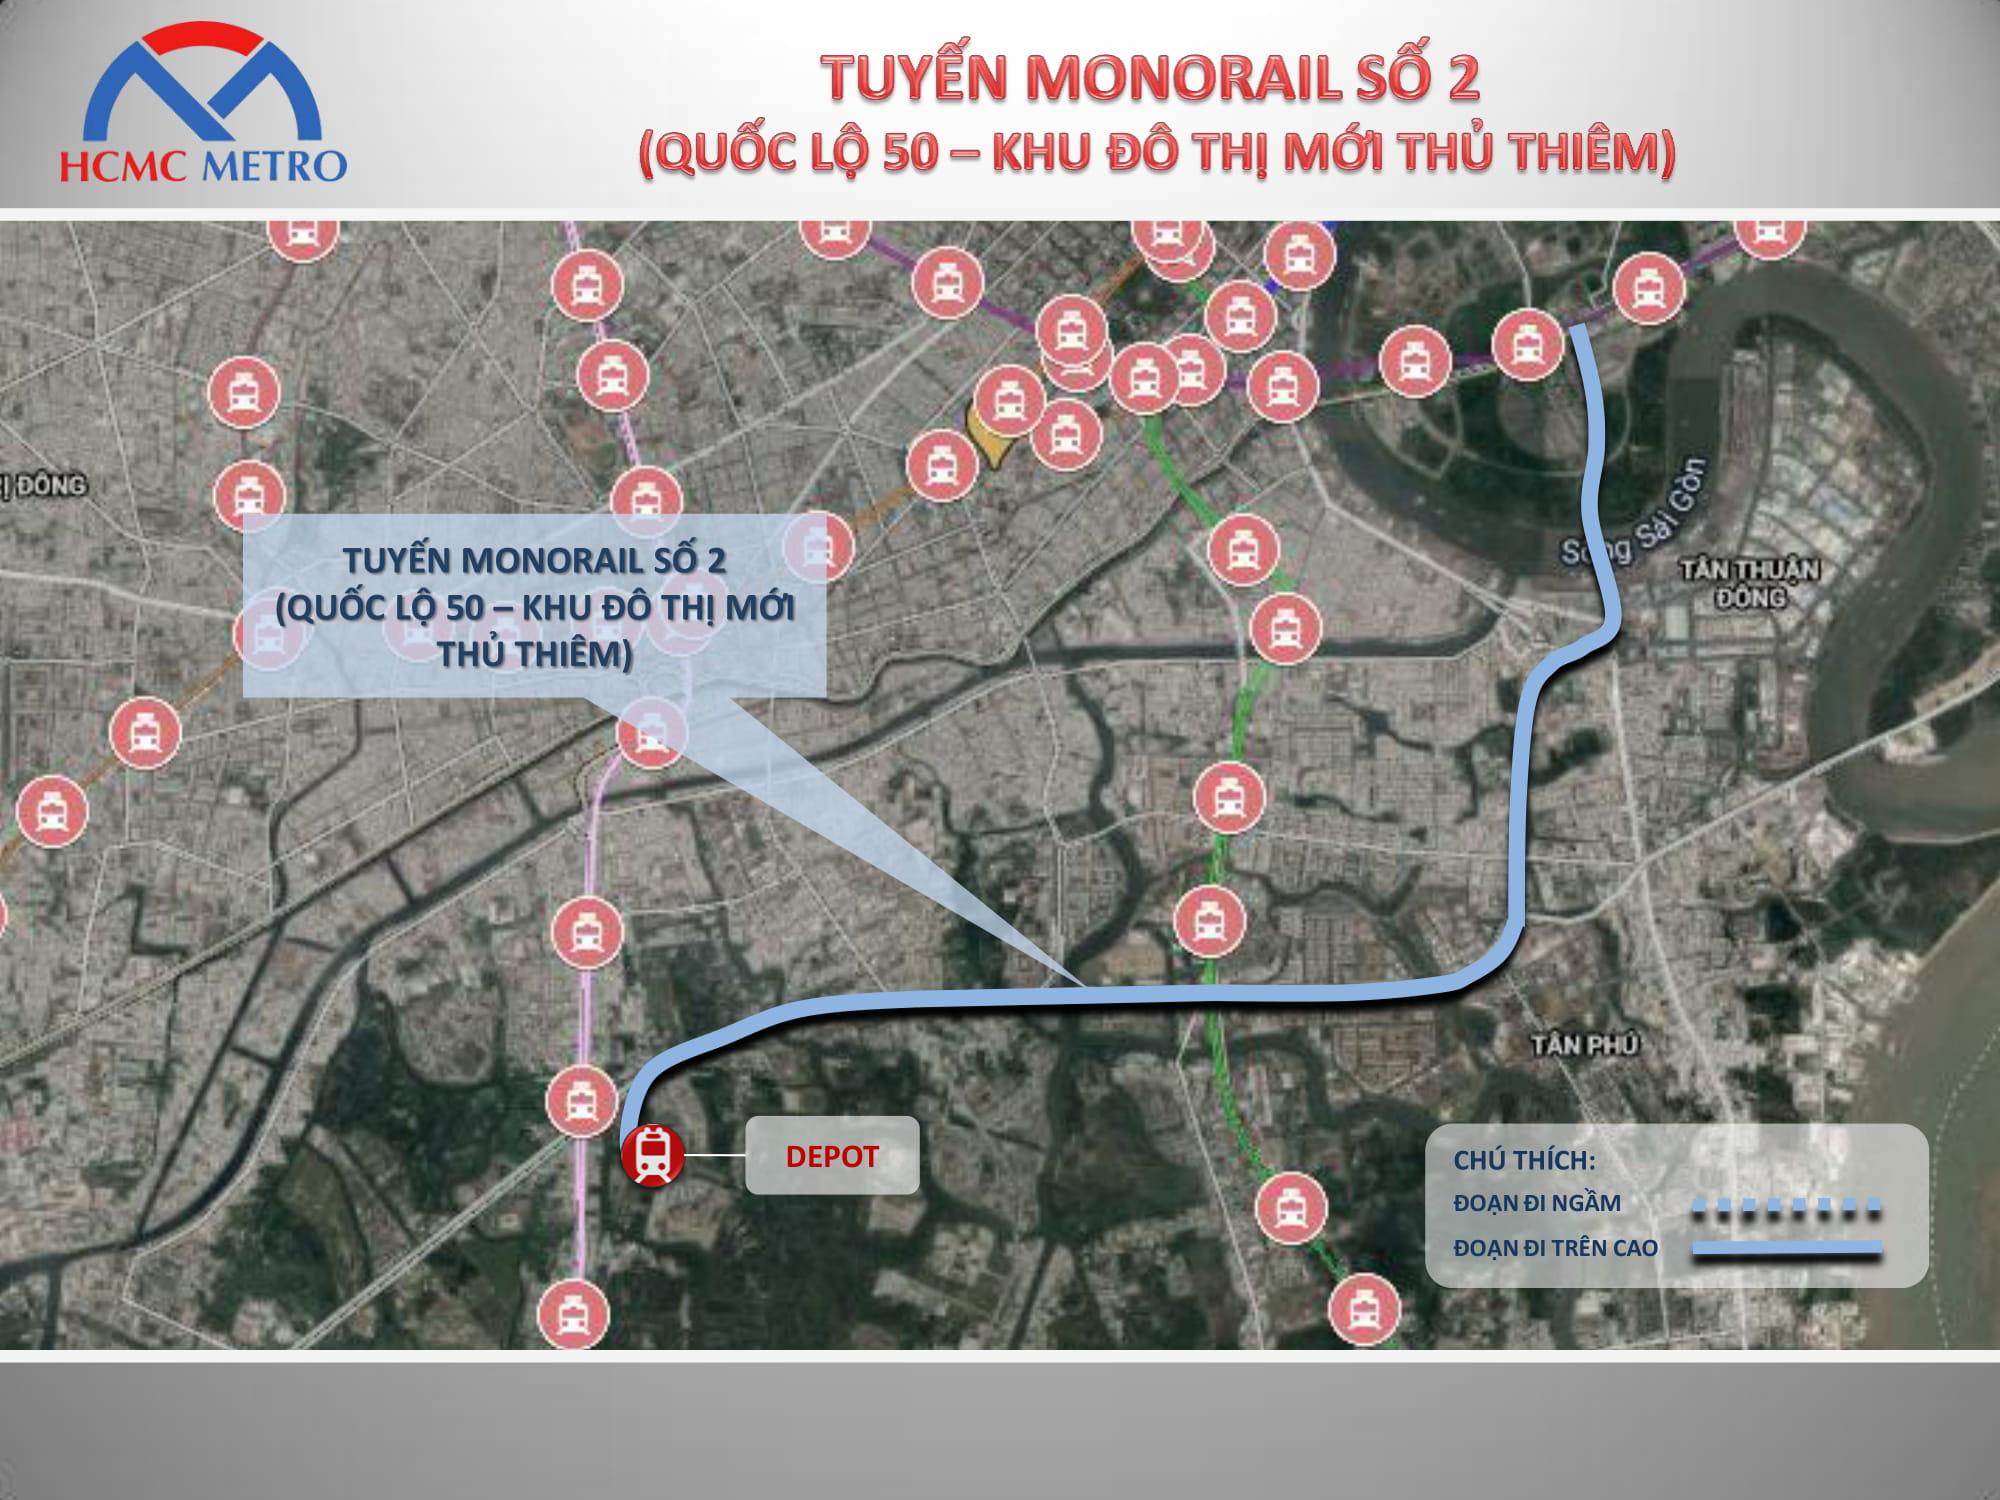 Tuyến Monorail số 02 TPHCM